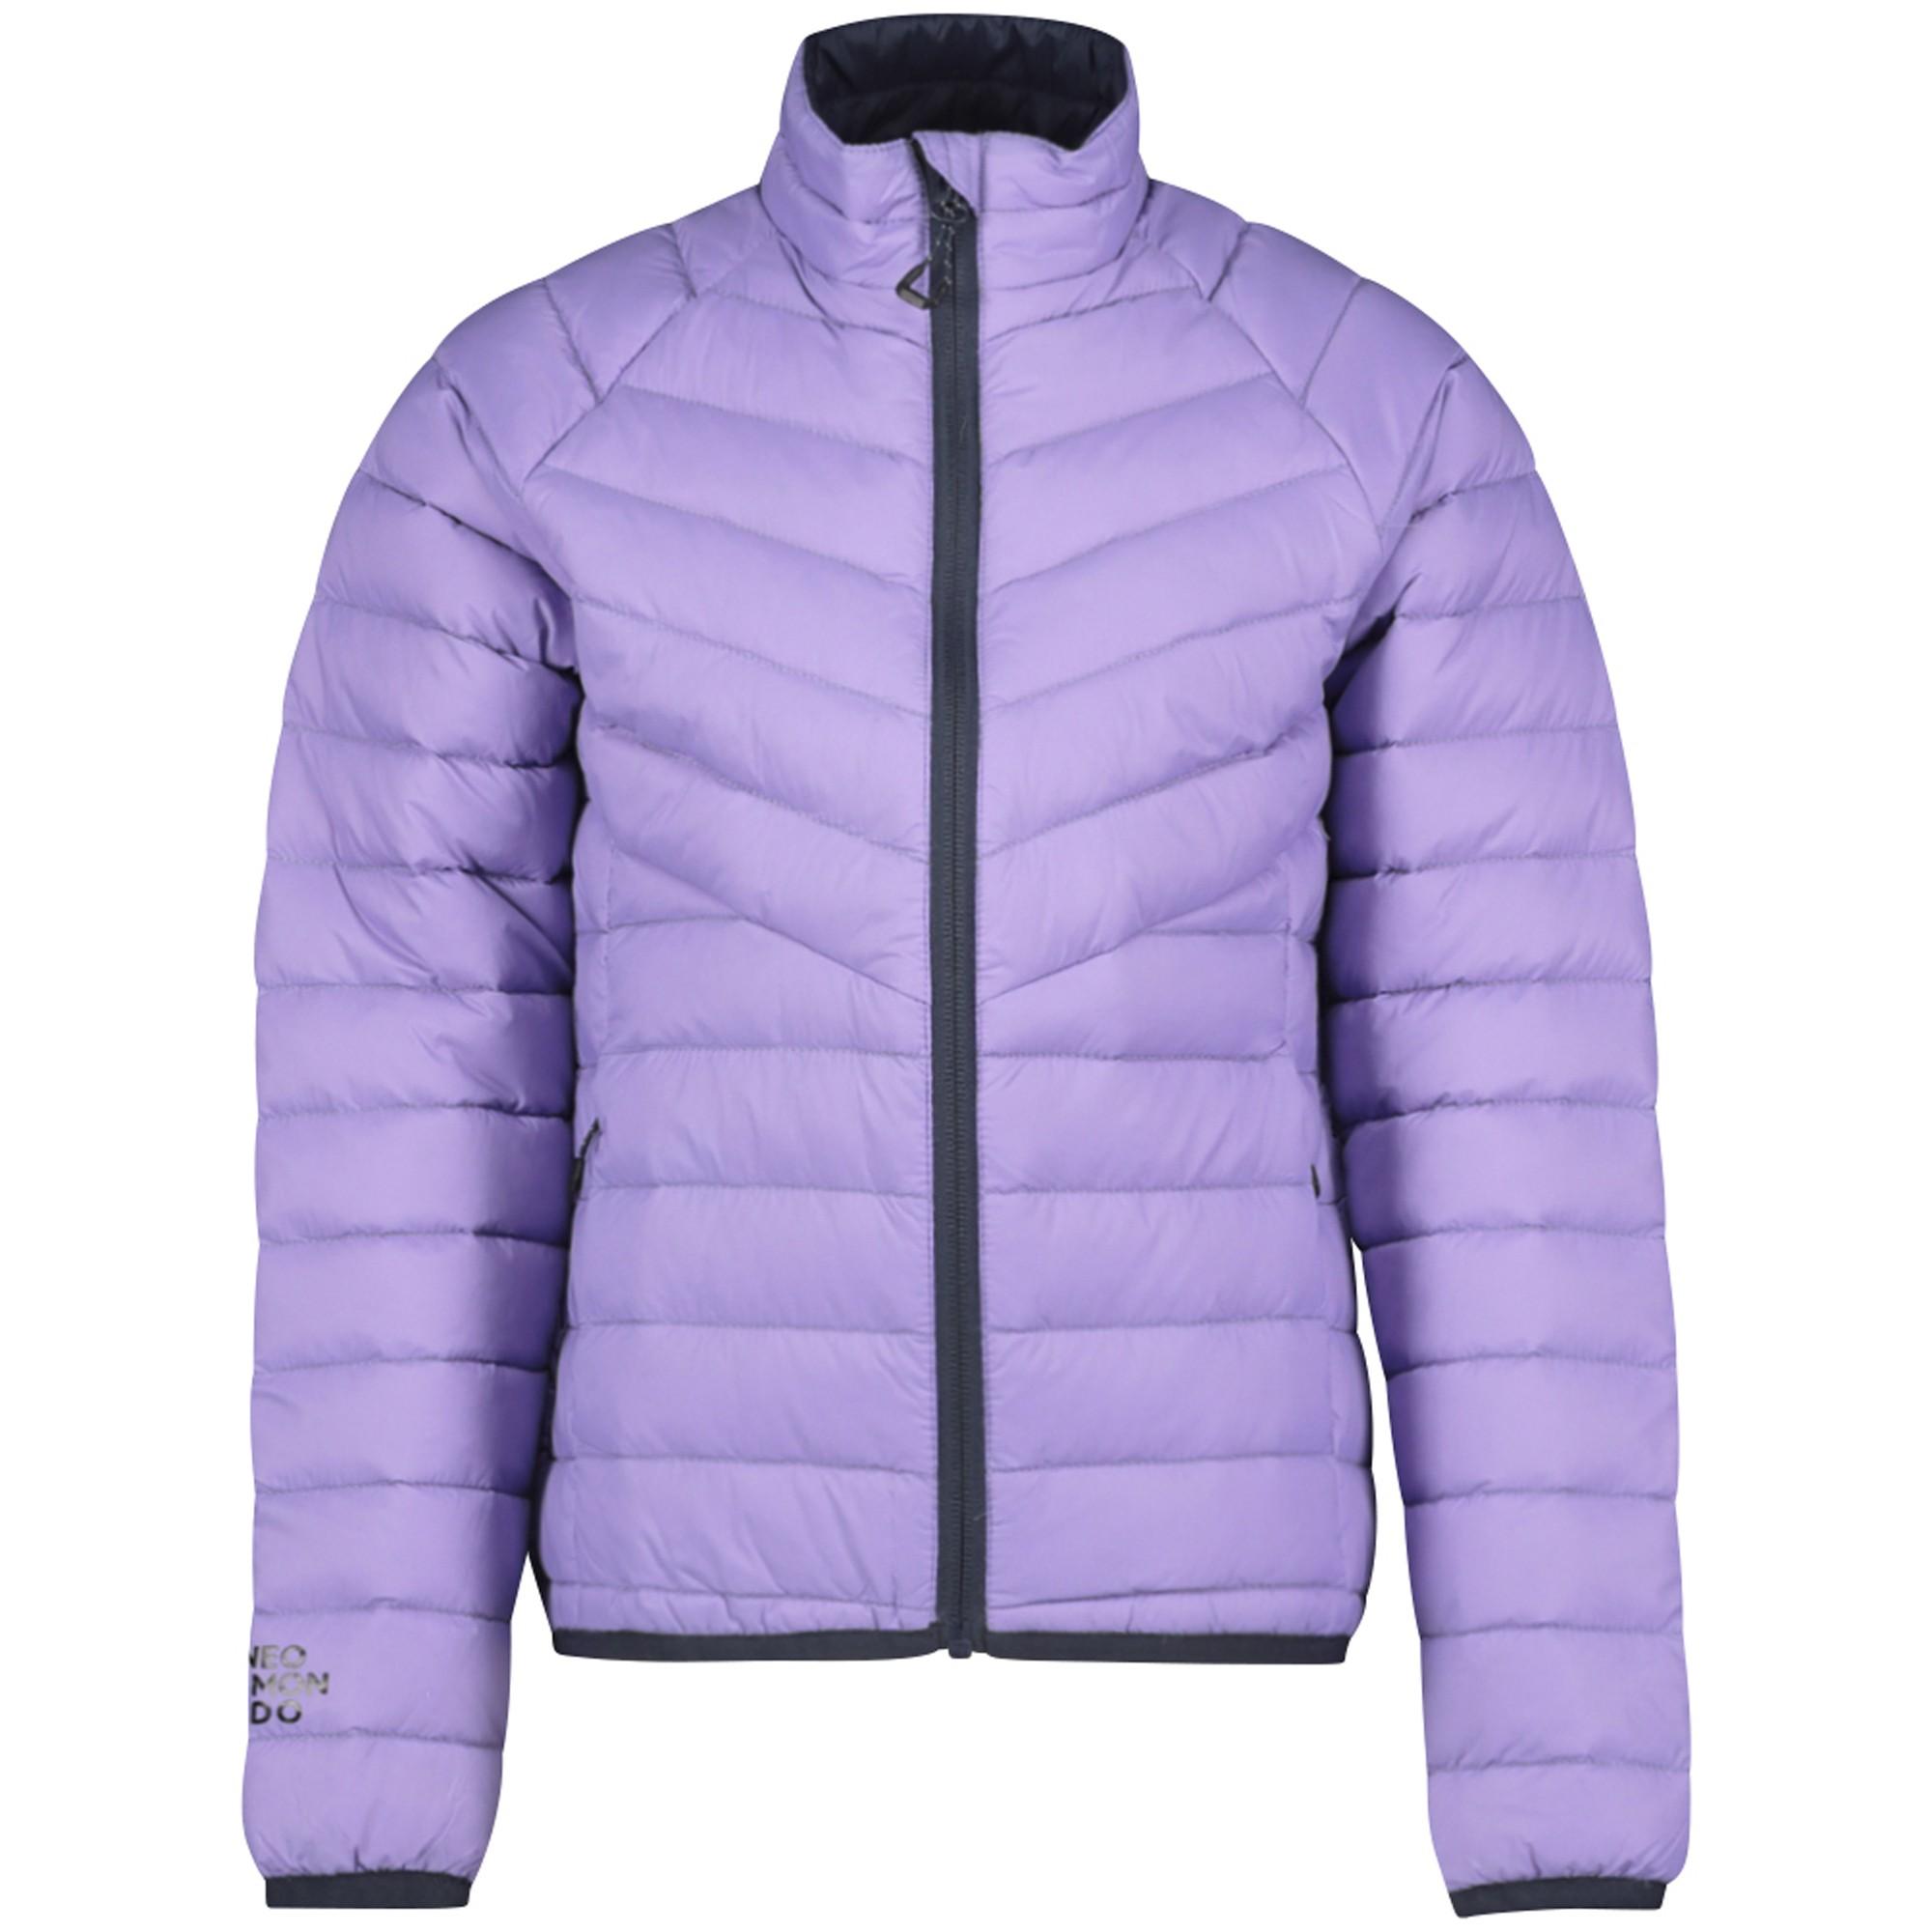 78608e8da https://www.xxlsports.at/outerstuff-nhl-primary-logo-t-shirt-junior-violett  ...